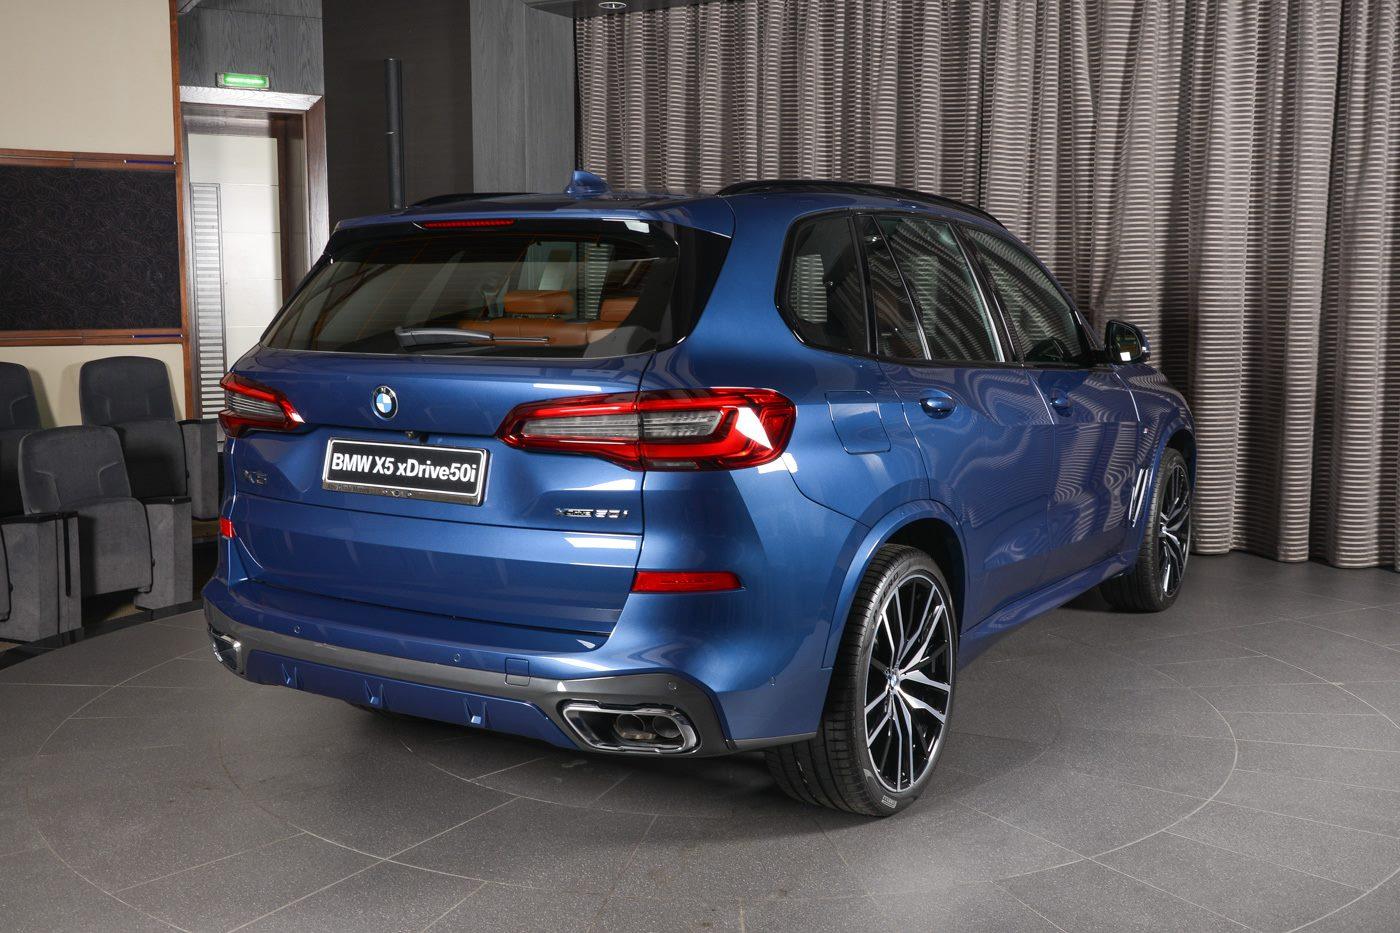 Bmw X5 G05 Mit V8 Motor Und M Sport Paket In Phytonic Blue